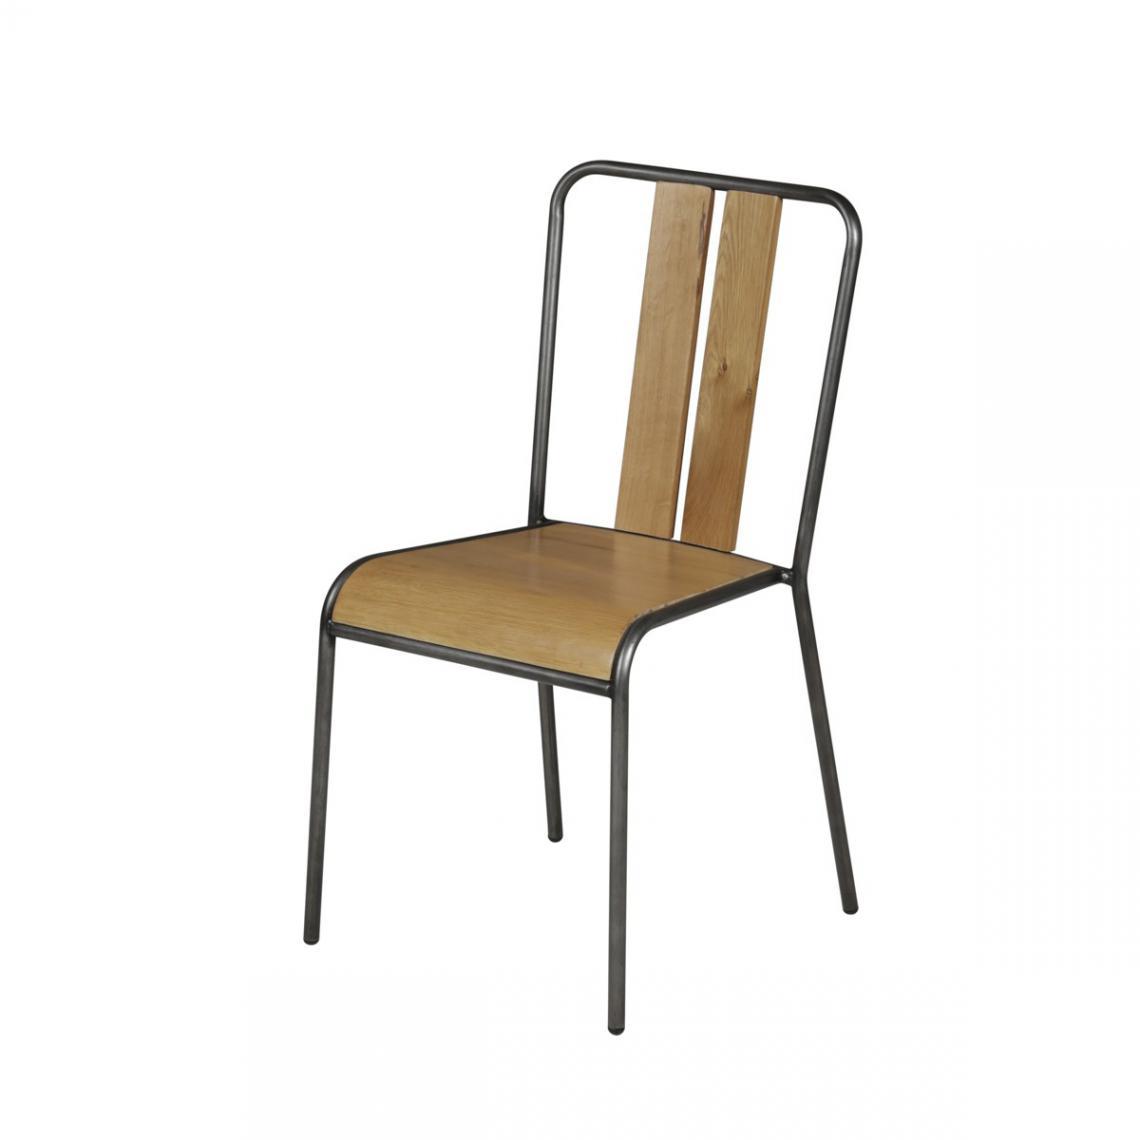 chaise empilable chene massif metal boston